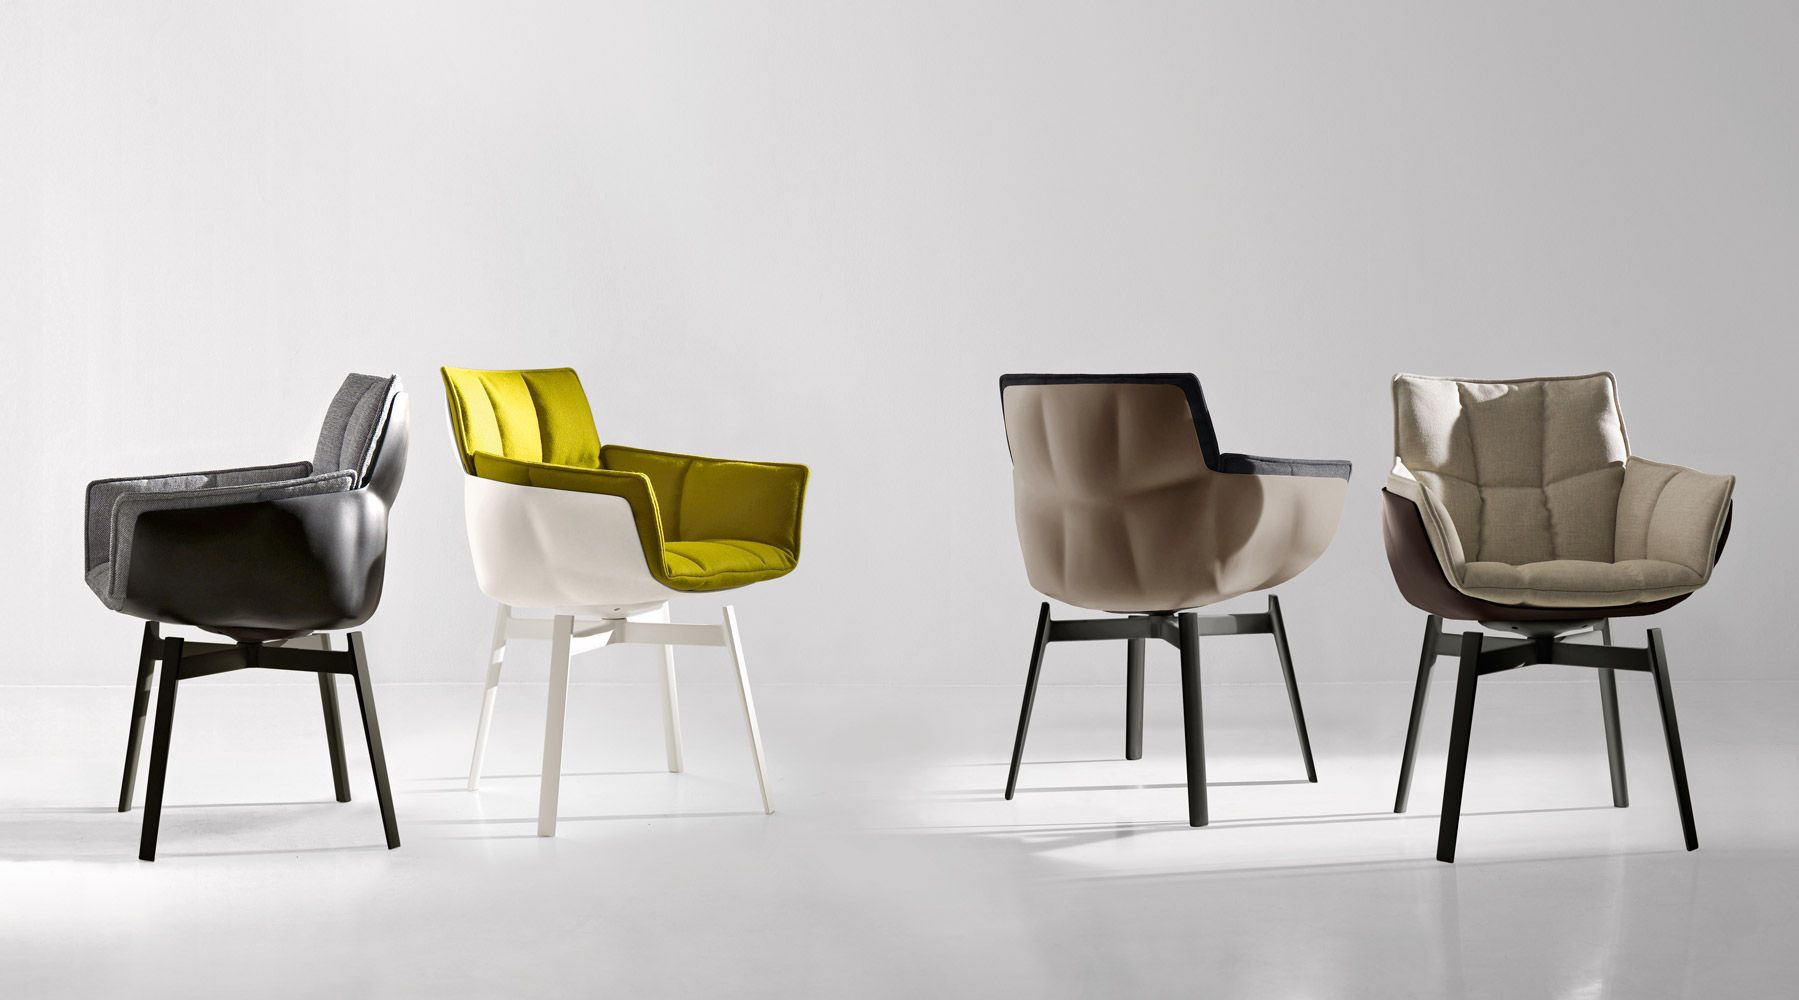 genial esszimmer sessel - Designer Stuhl Esszimmer